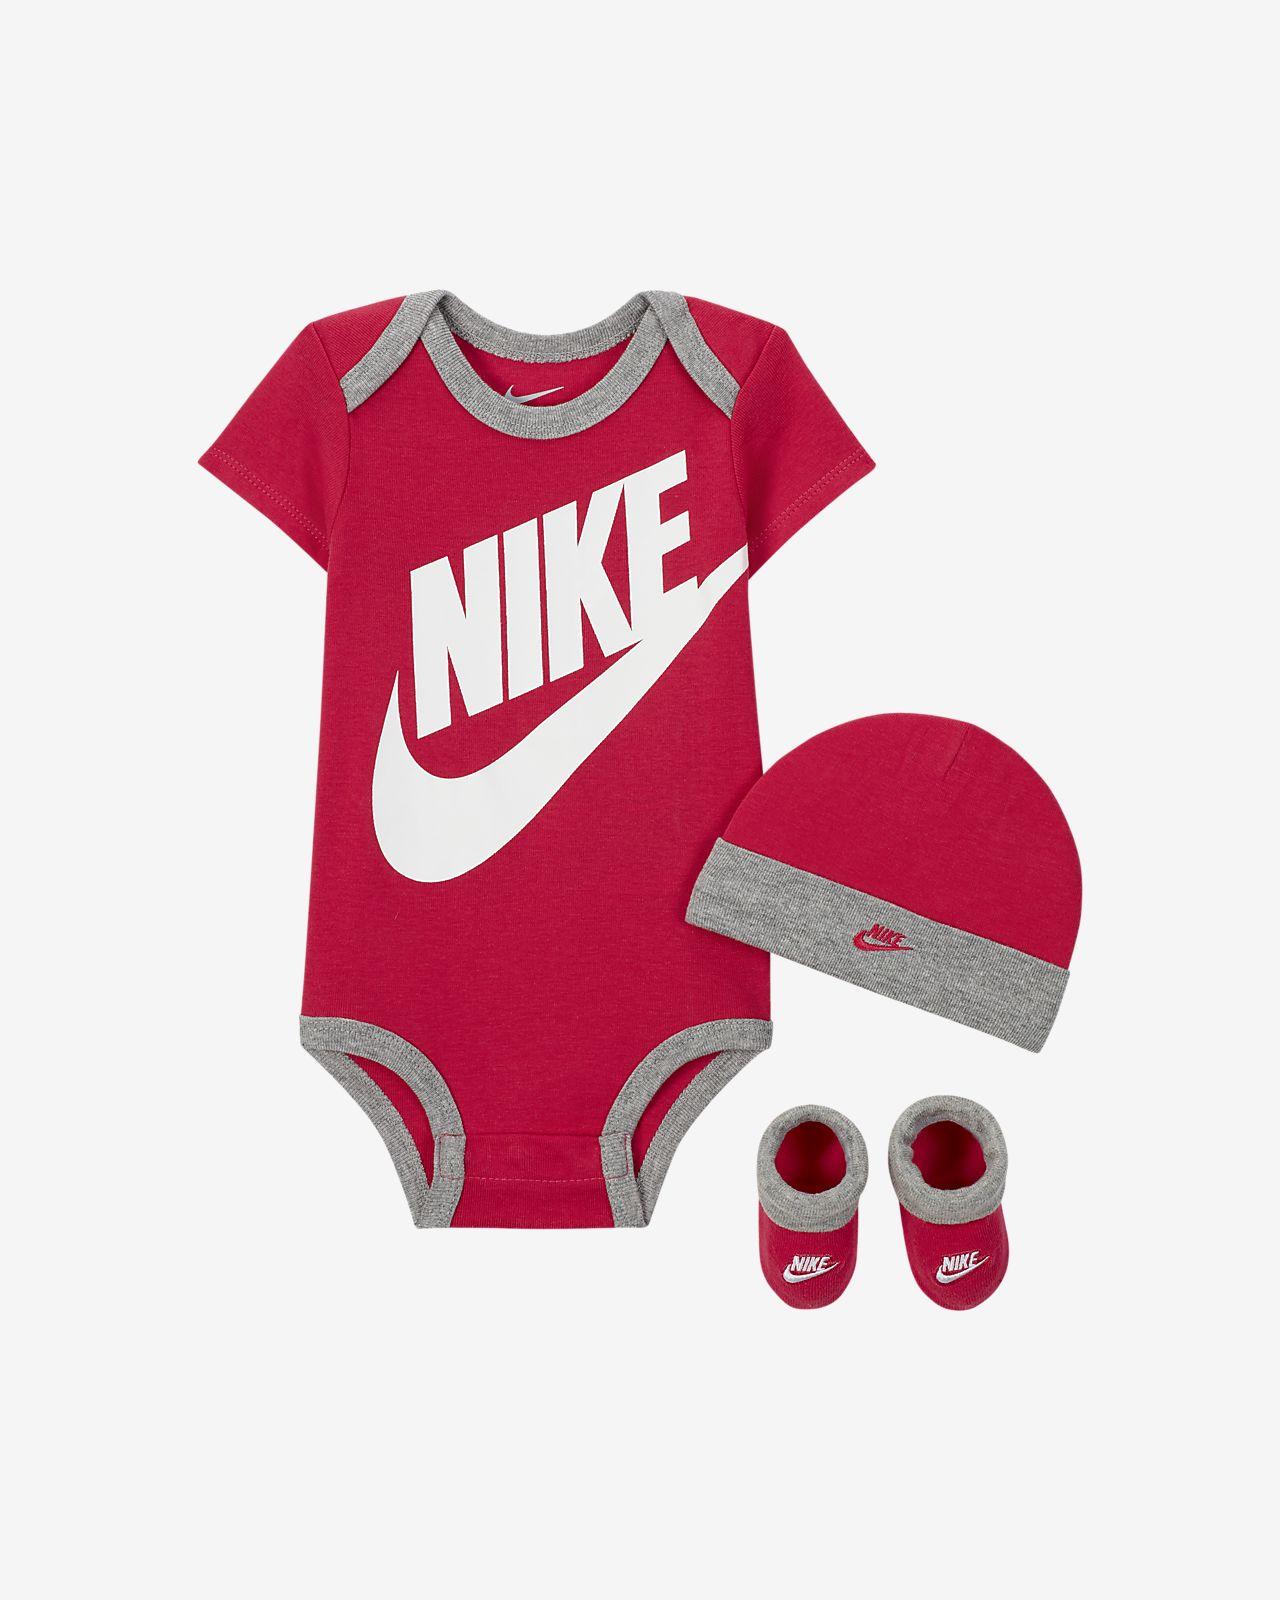 Nike Sportswear Baby Bodysuit, Hat and Booties Box Set